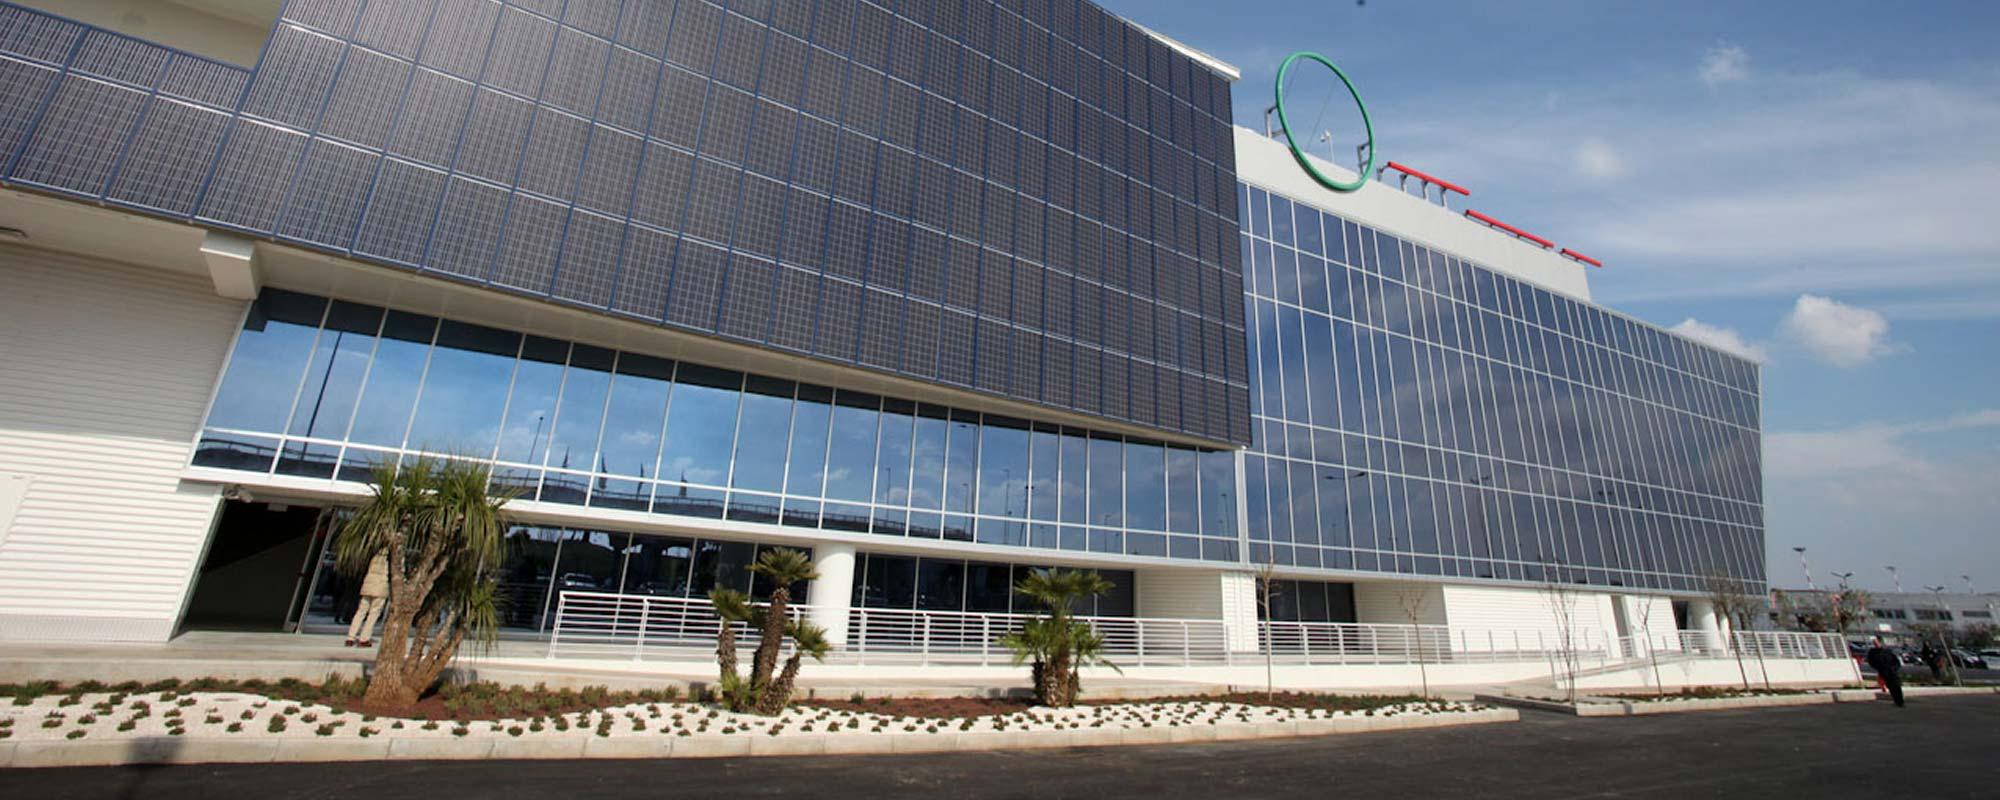 TE2C Tecno Engineering 2C S.r.l. | Airport Planning and Design